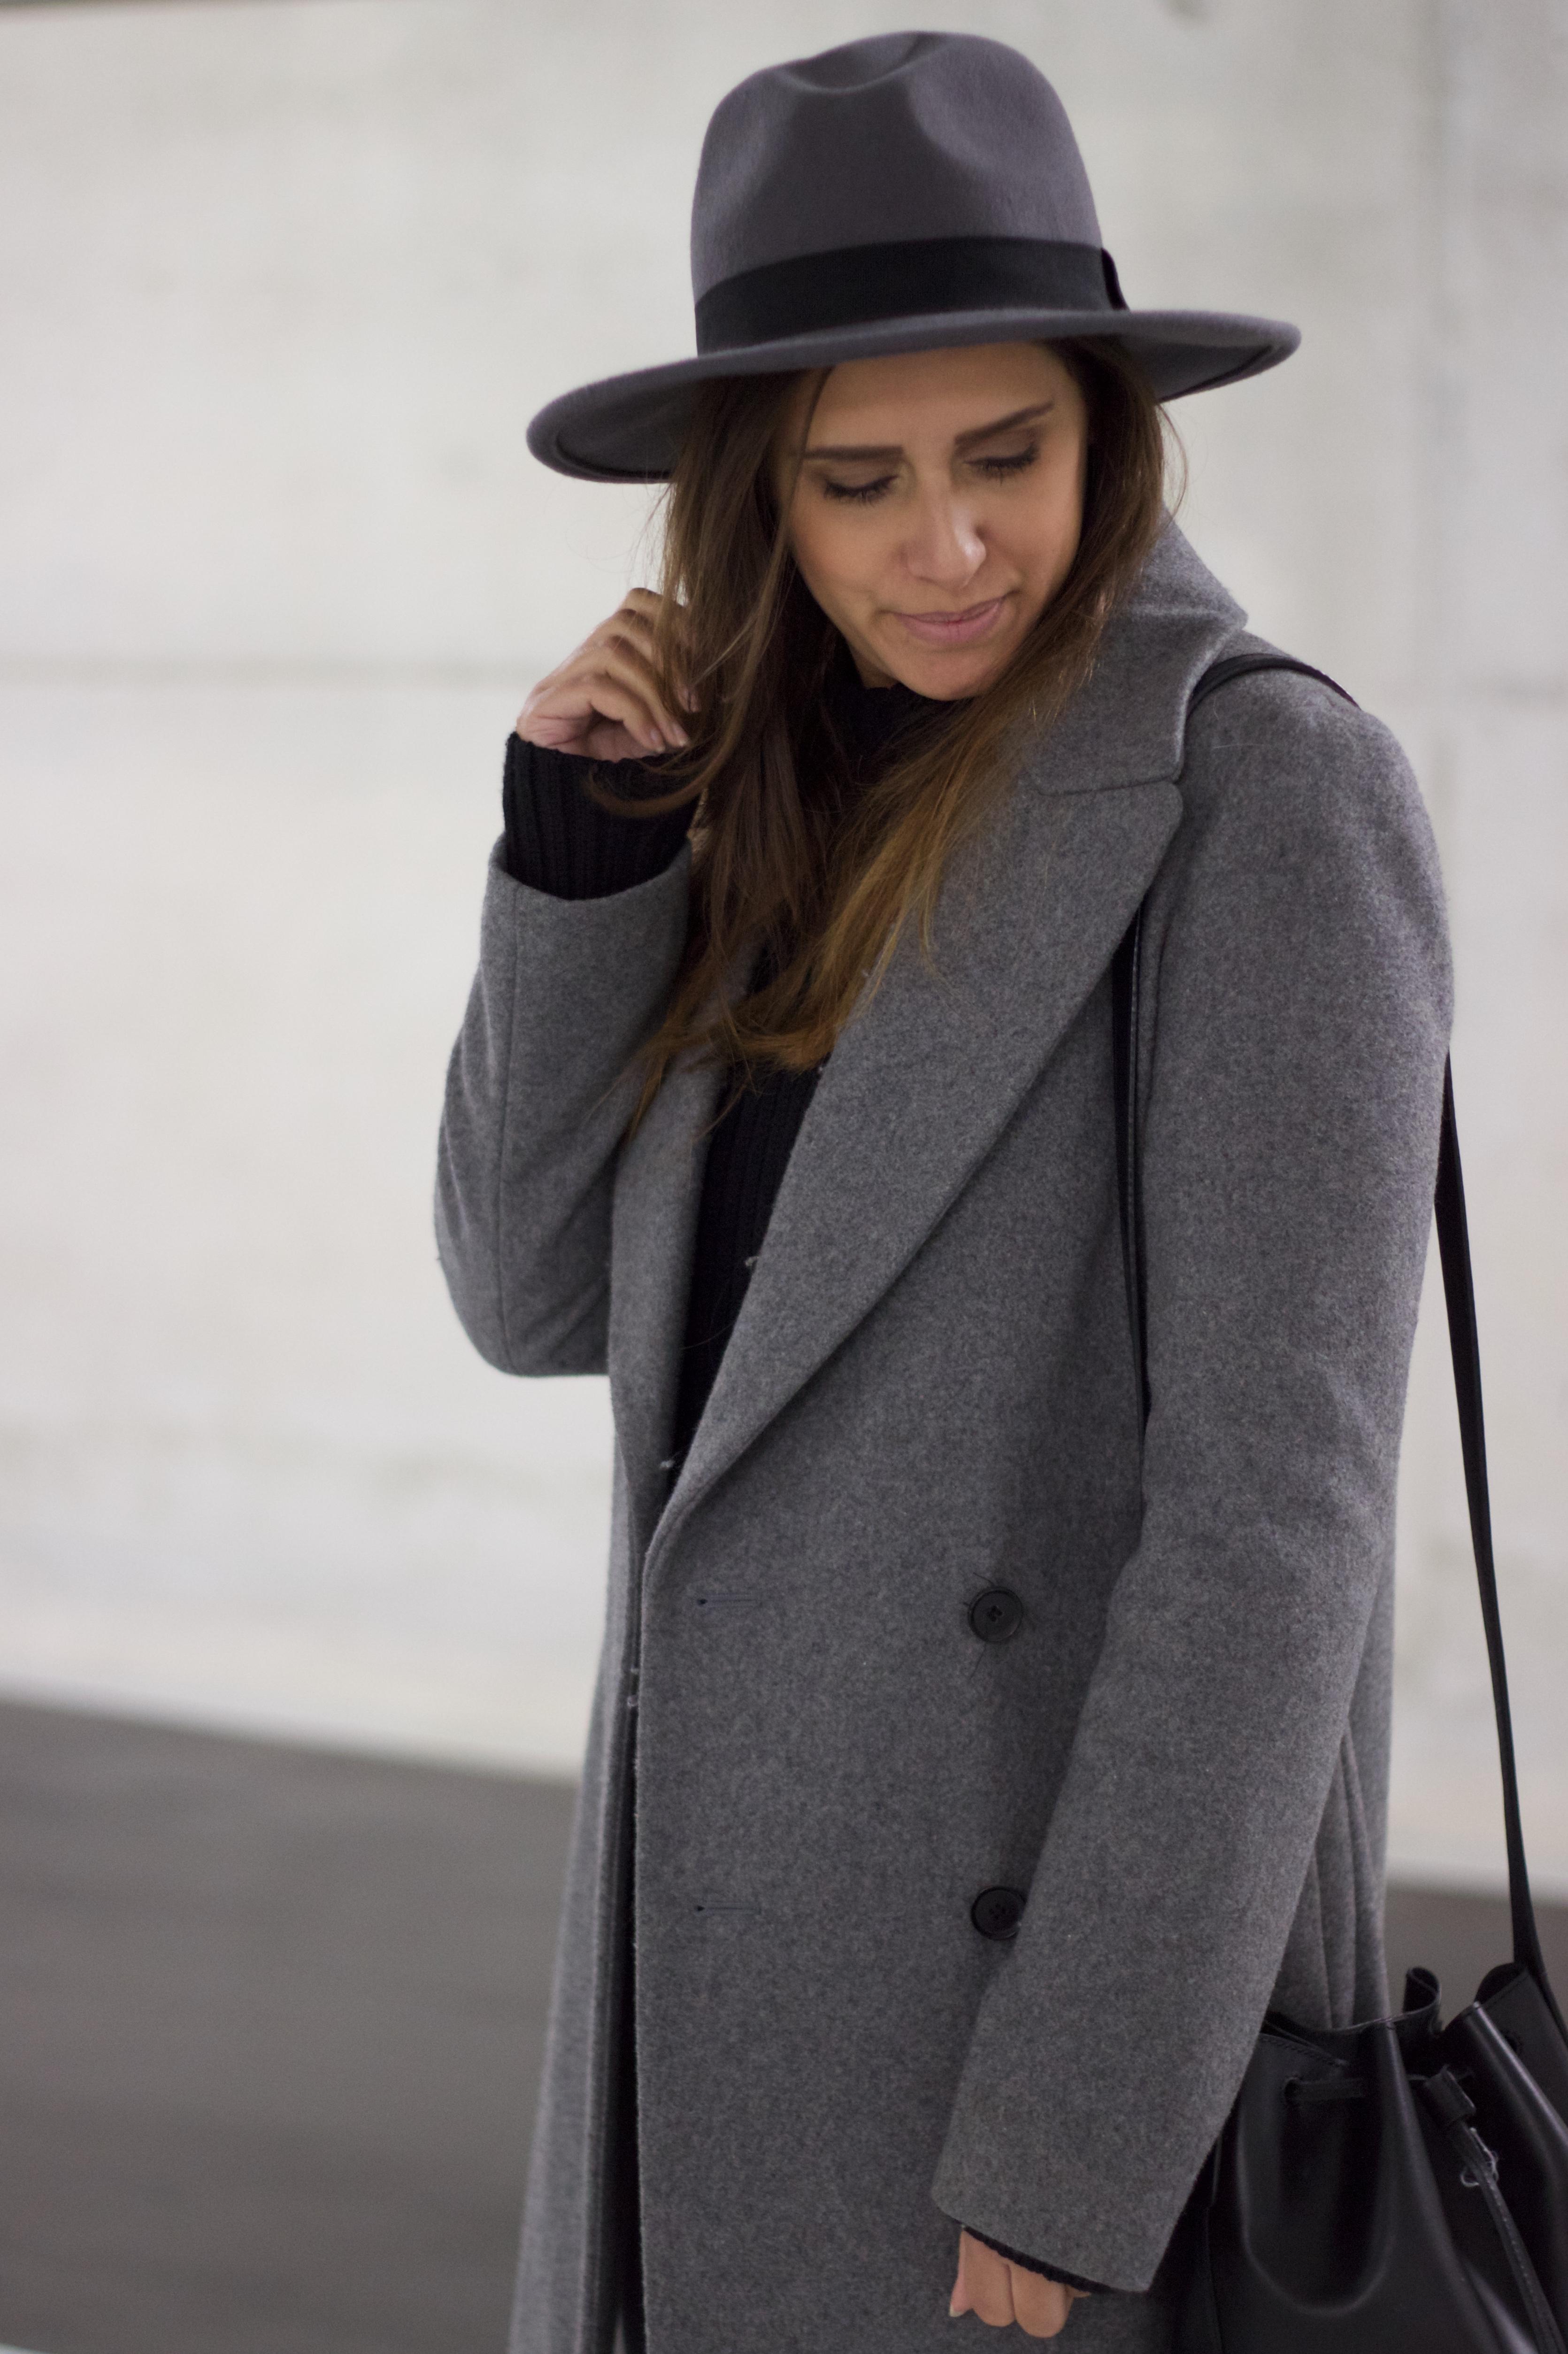 Monochrome-hat-wide-brim-grey-tone-tones